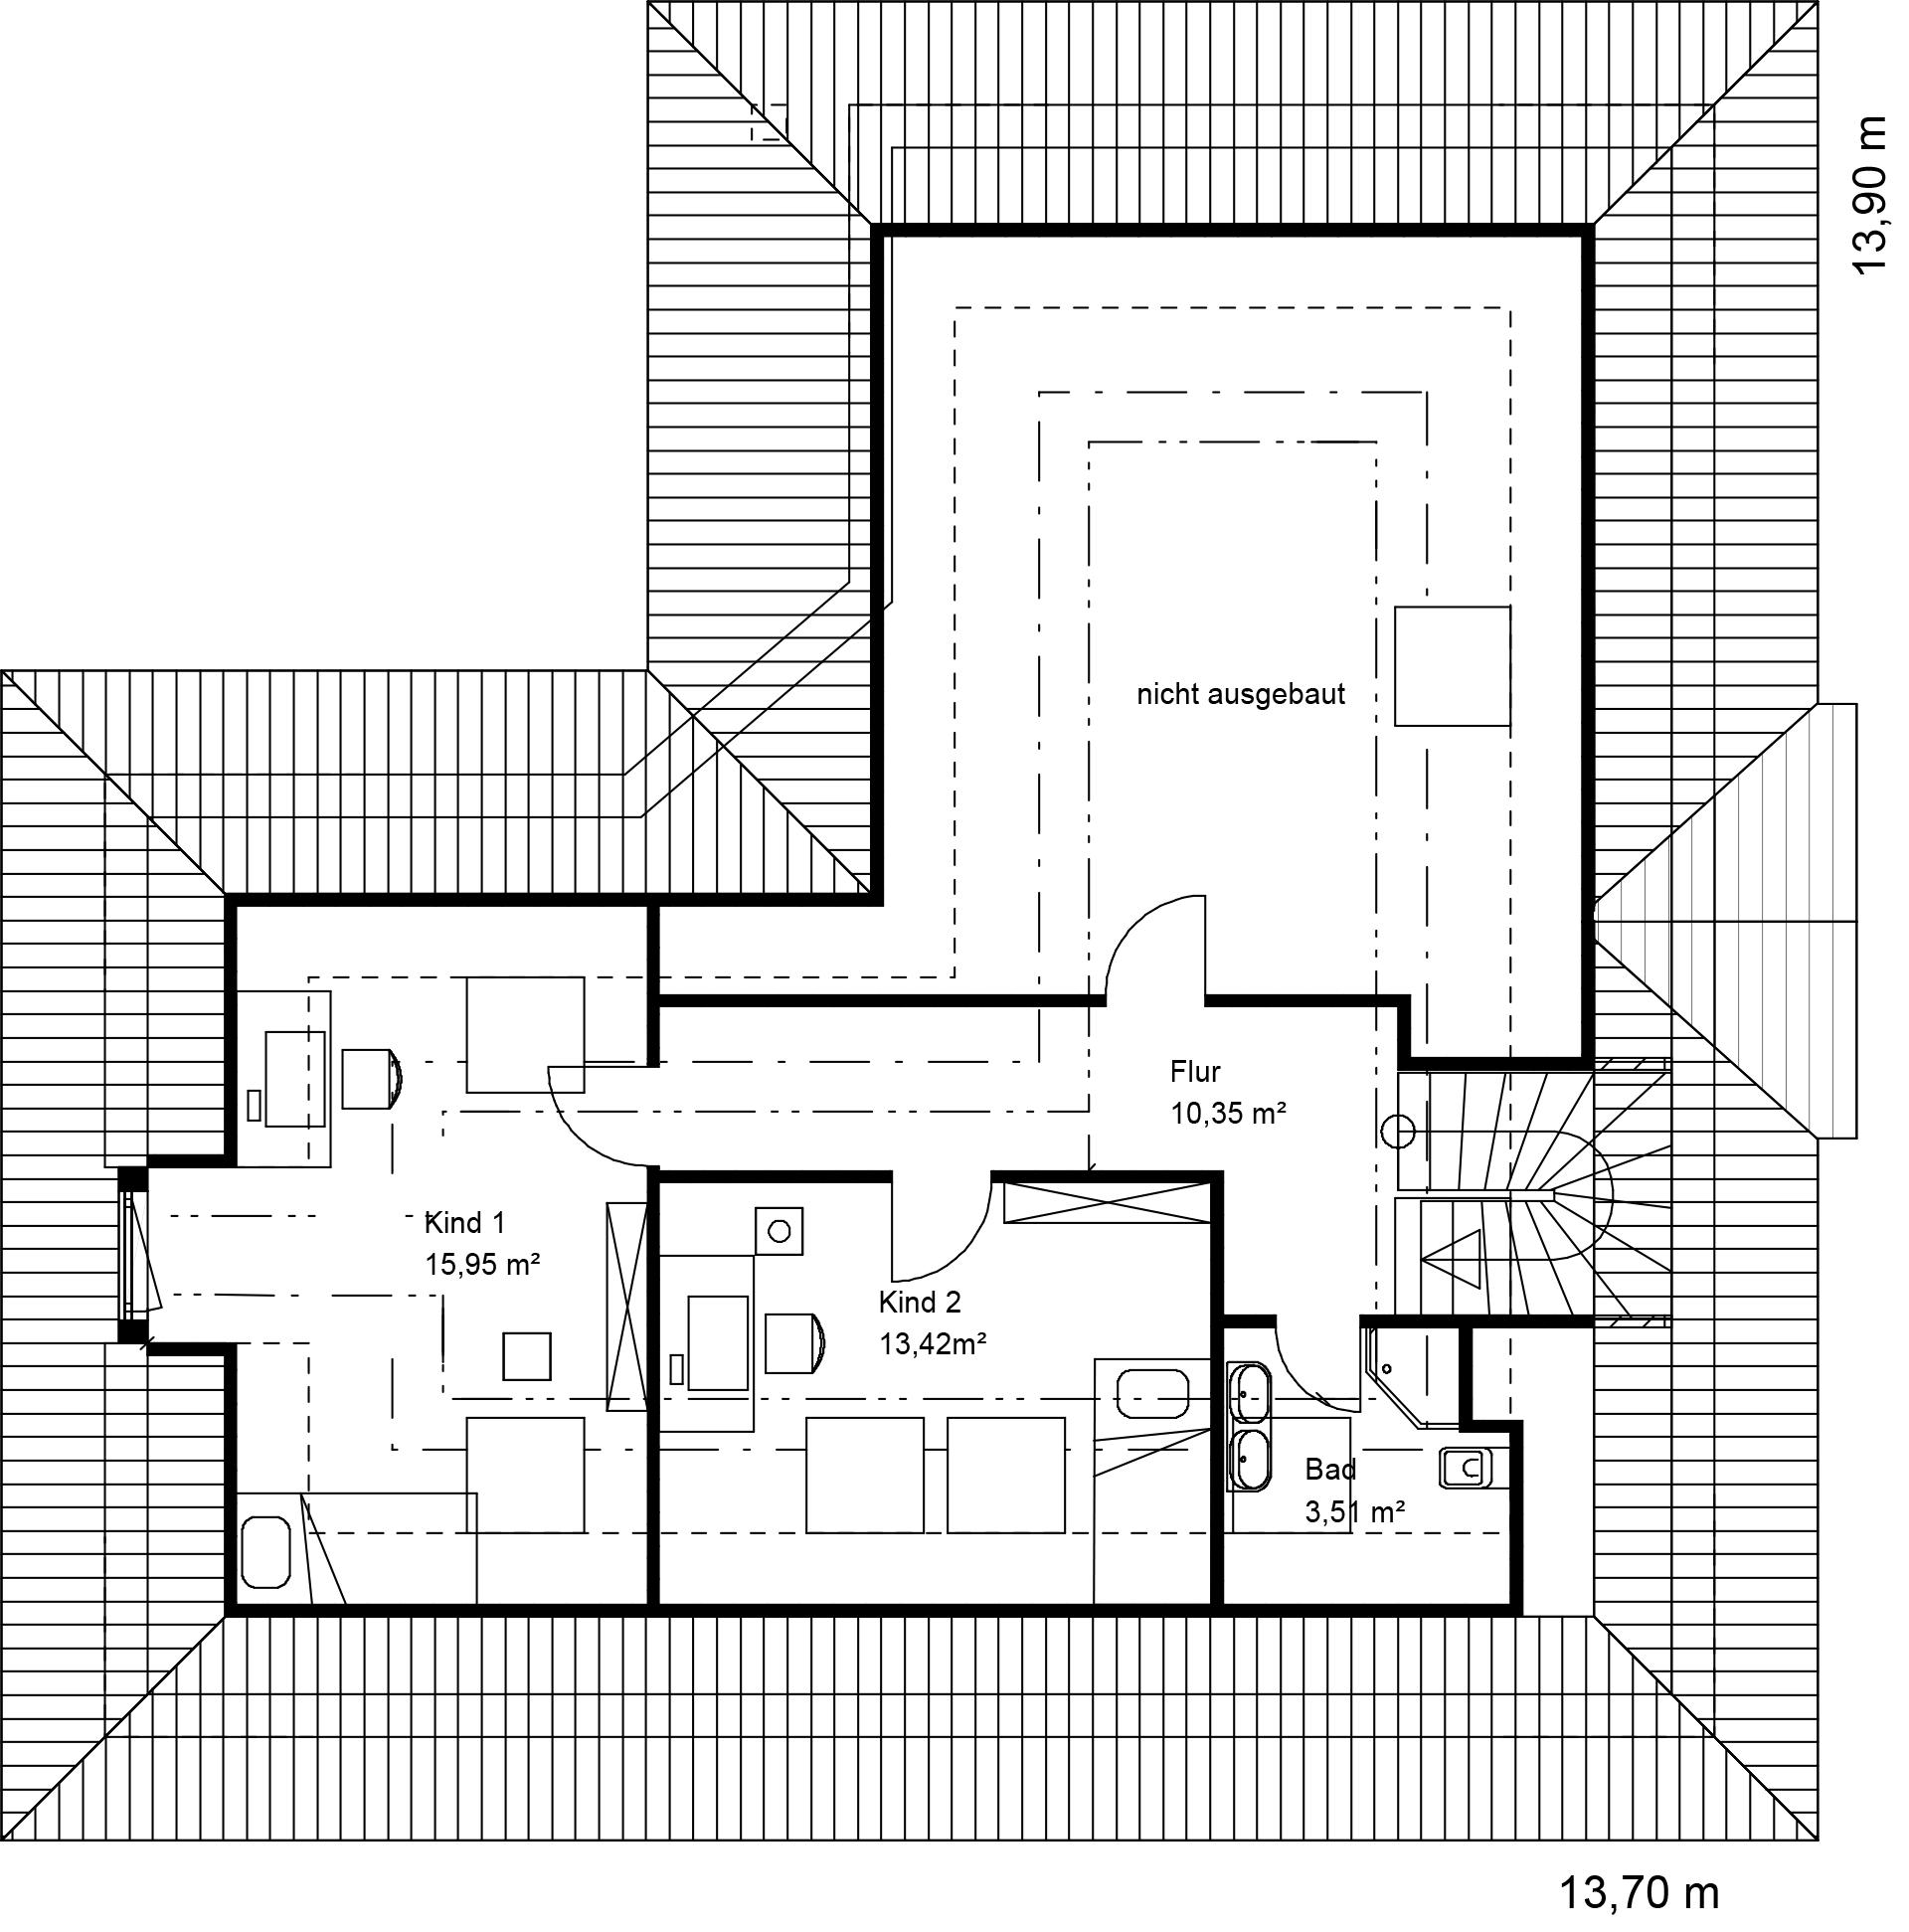 Bungalow 35° Walmdach - Fuchs Baugesellschaft mbH